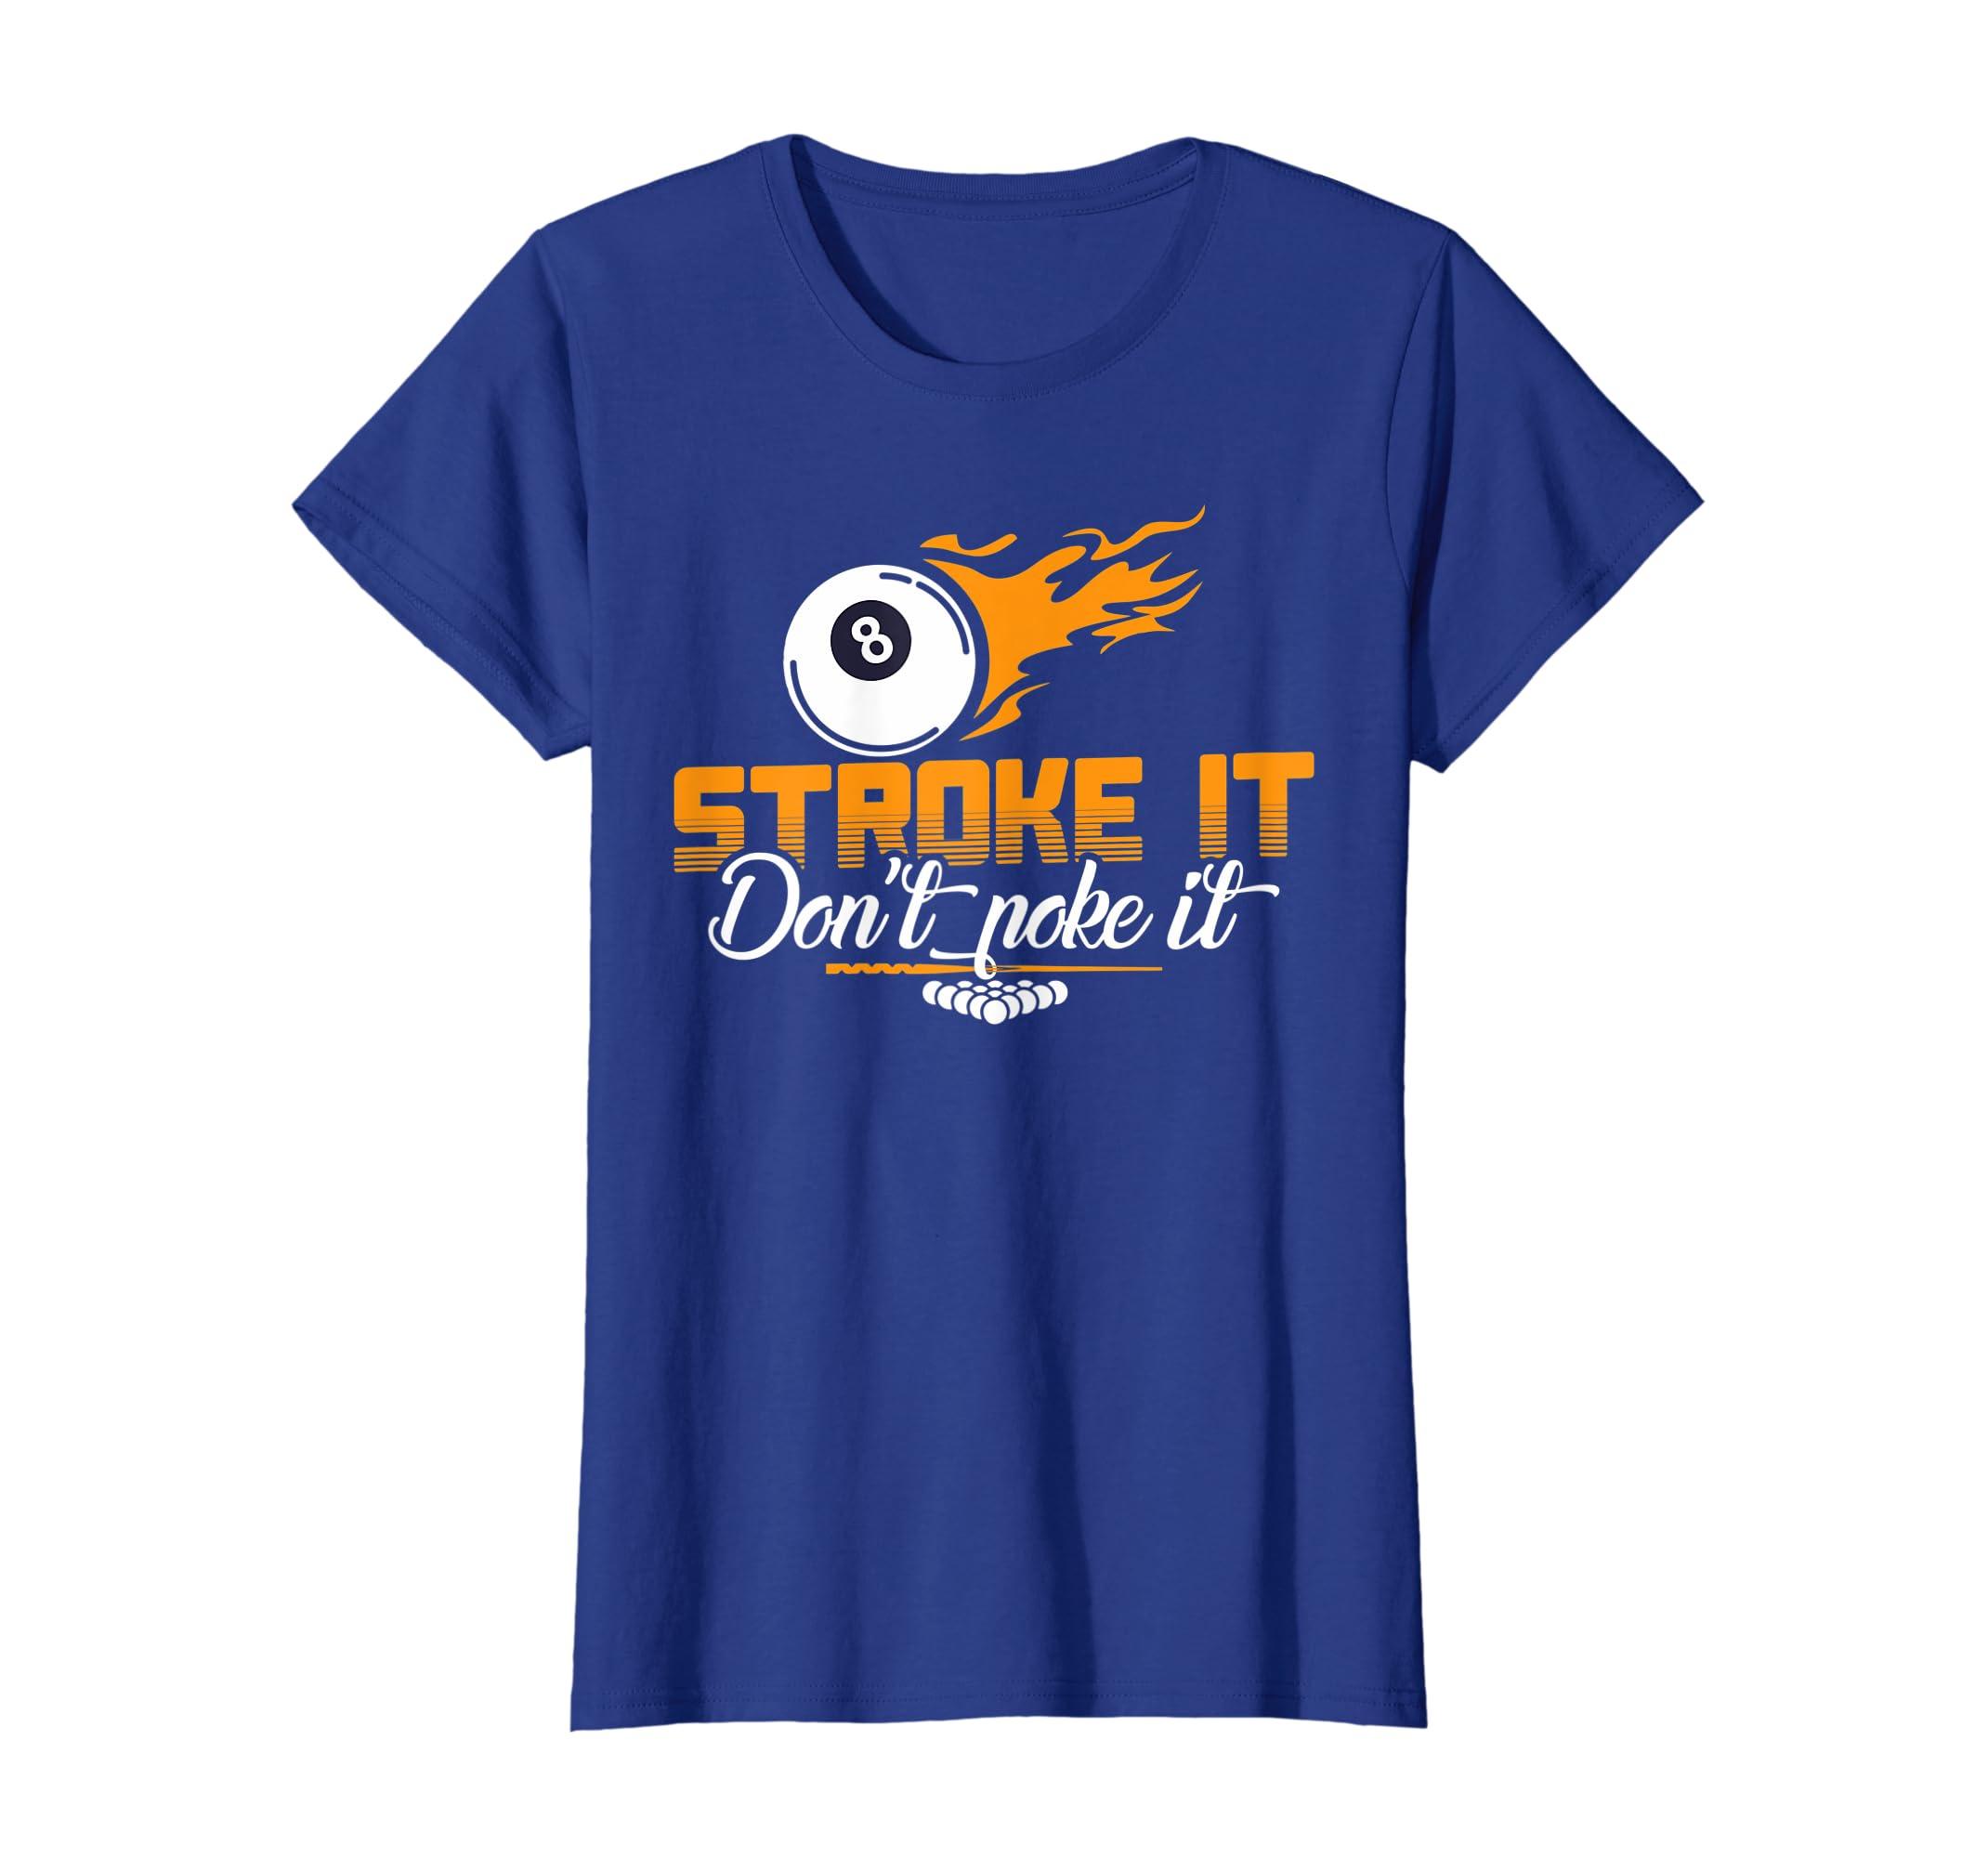 b503559fd0 Amazon.com: Funny Billiard T Shirts Pool Players Shirt Pool Lover Gifts:  Clothing